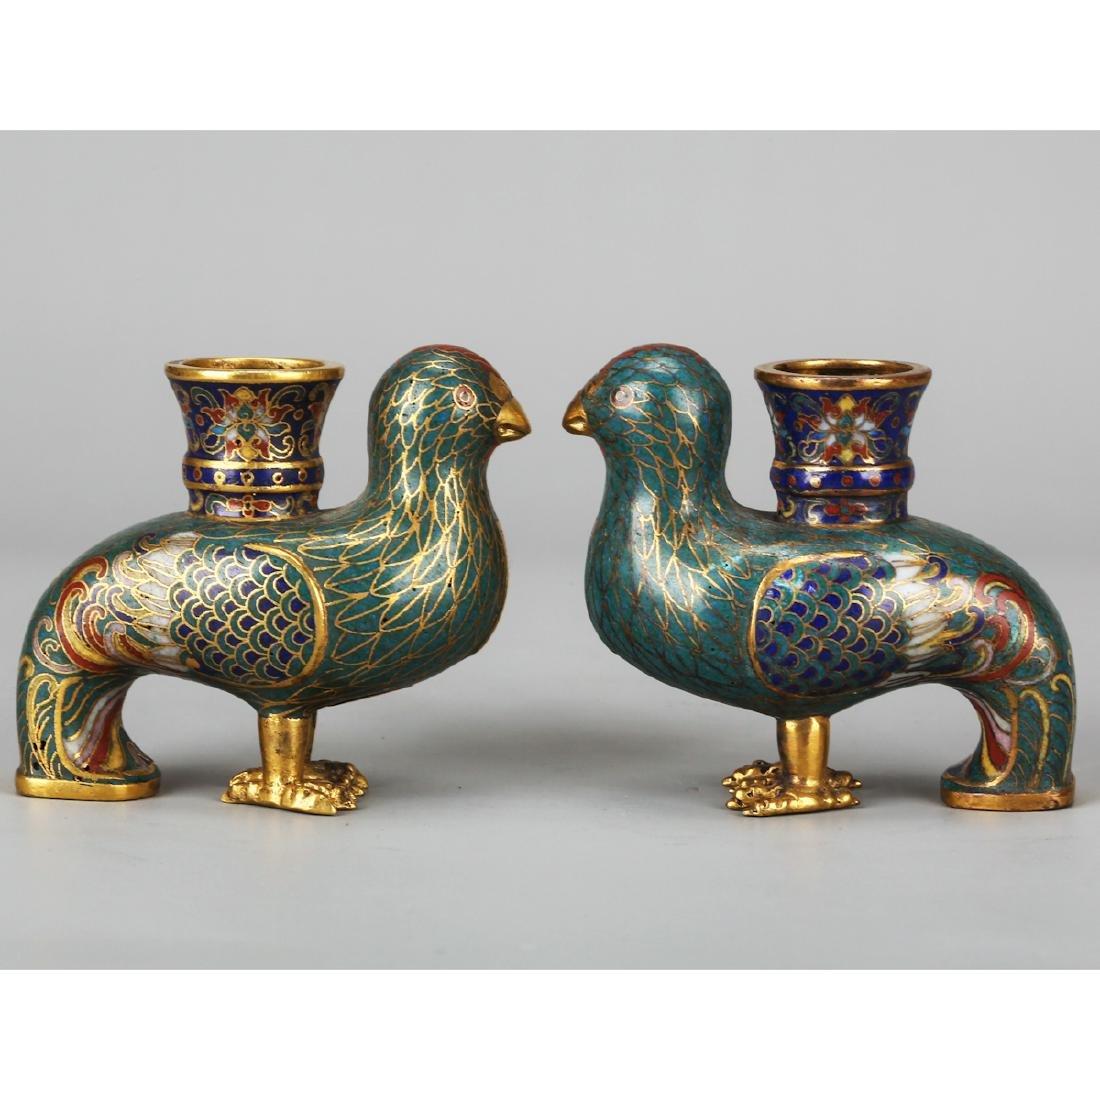 CHINESE CLOISONNE BIRD VASES, PAIR - 2